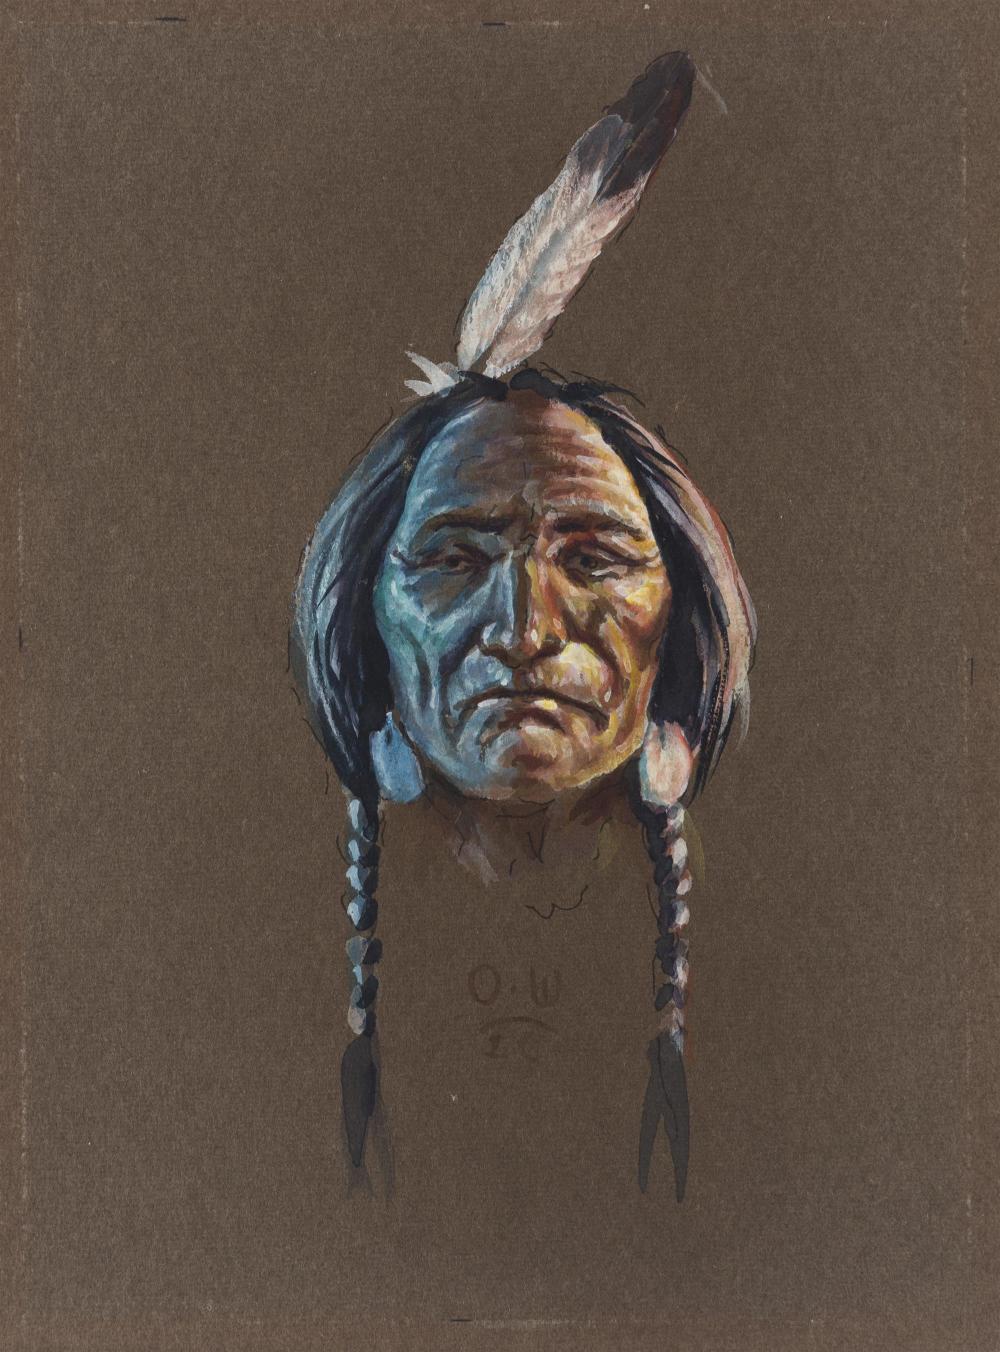 "Olaf Wieghorst, (1899-1988 El Cajon, CA), Portrait of an American Indian brave, Gouache on paper under glass, Sight: 6.75"" H x 4.75"" W"